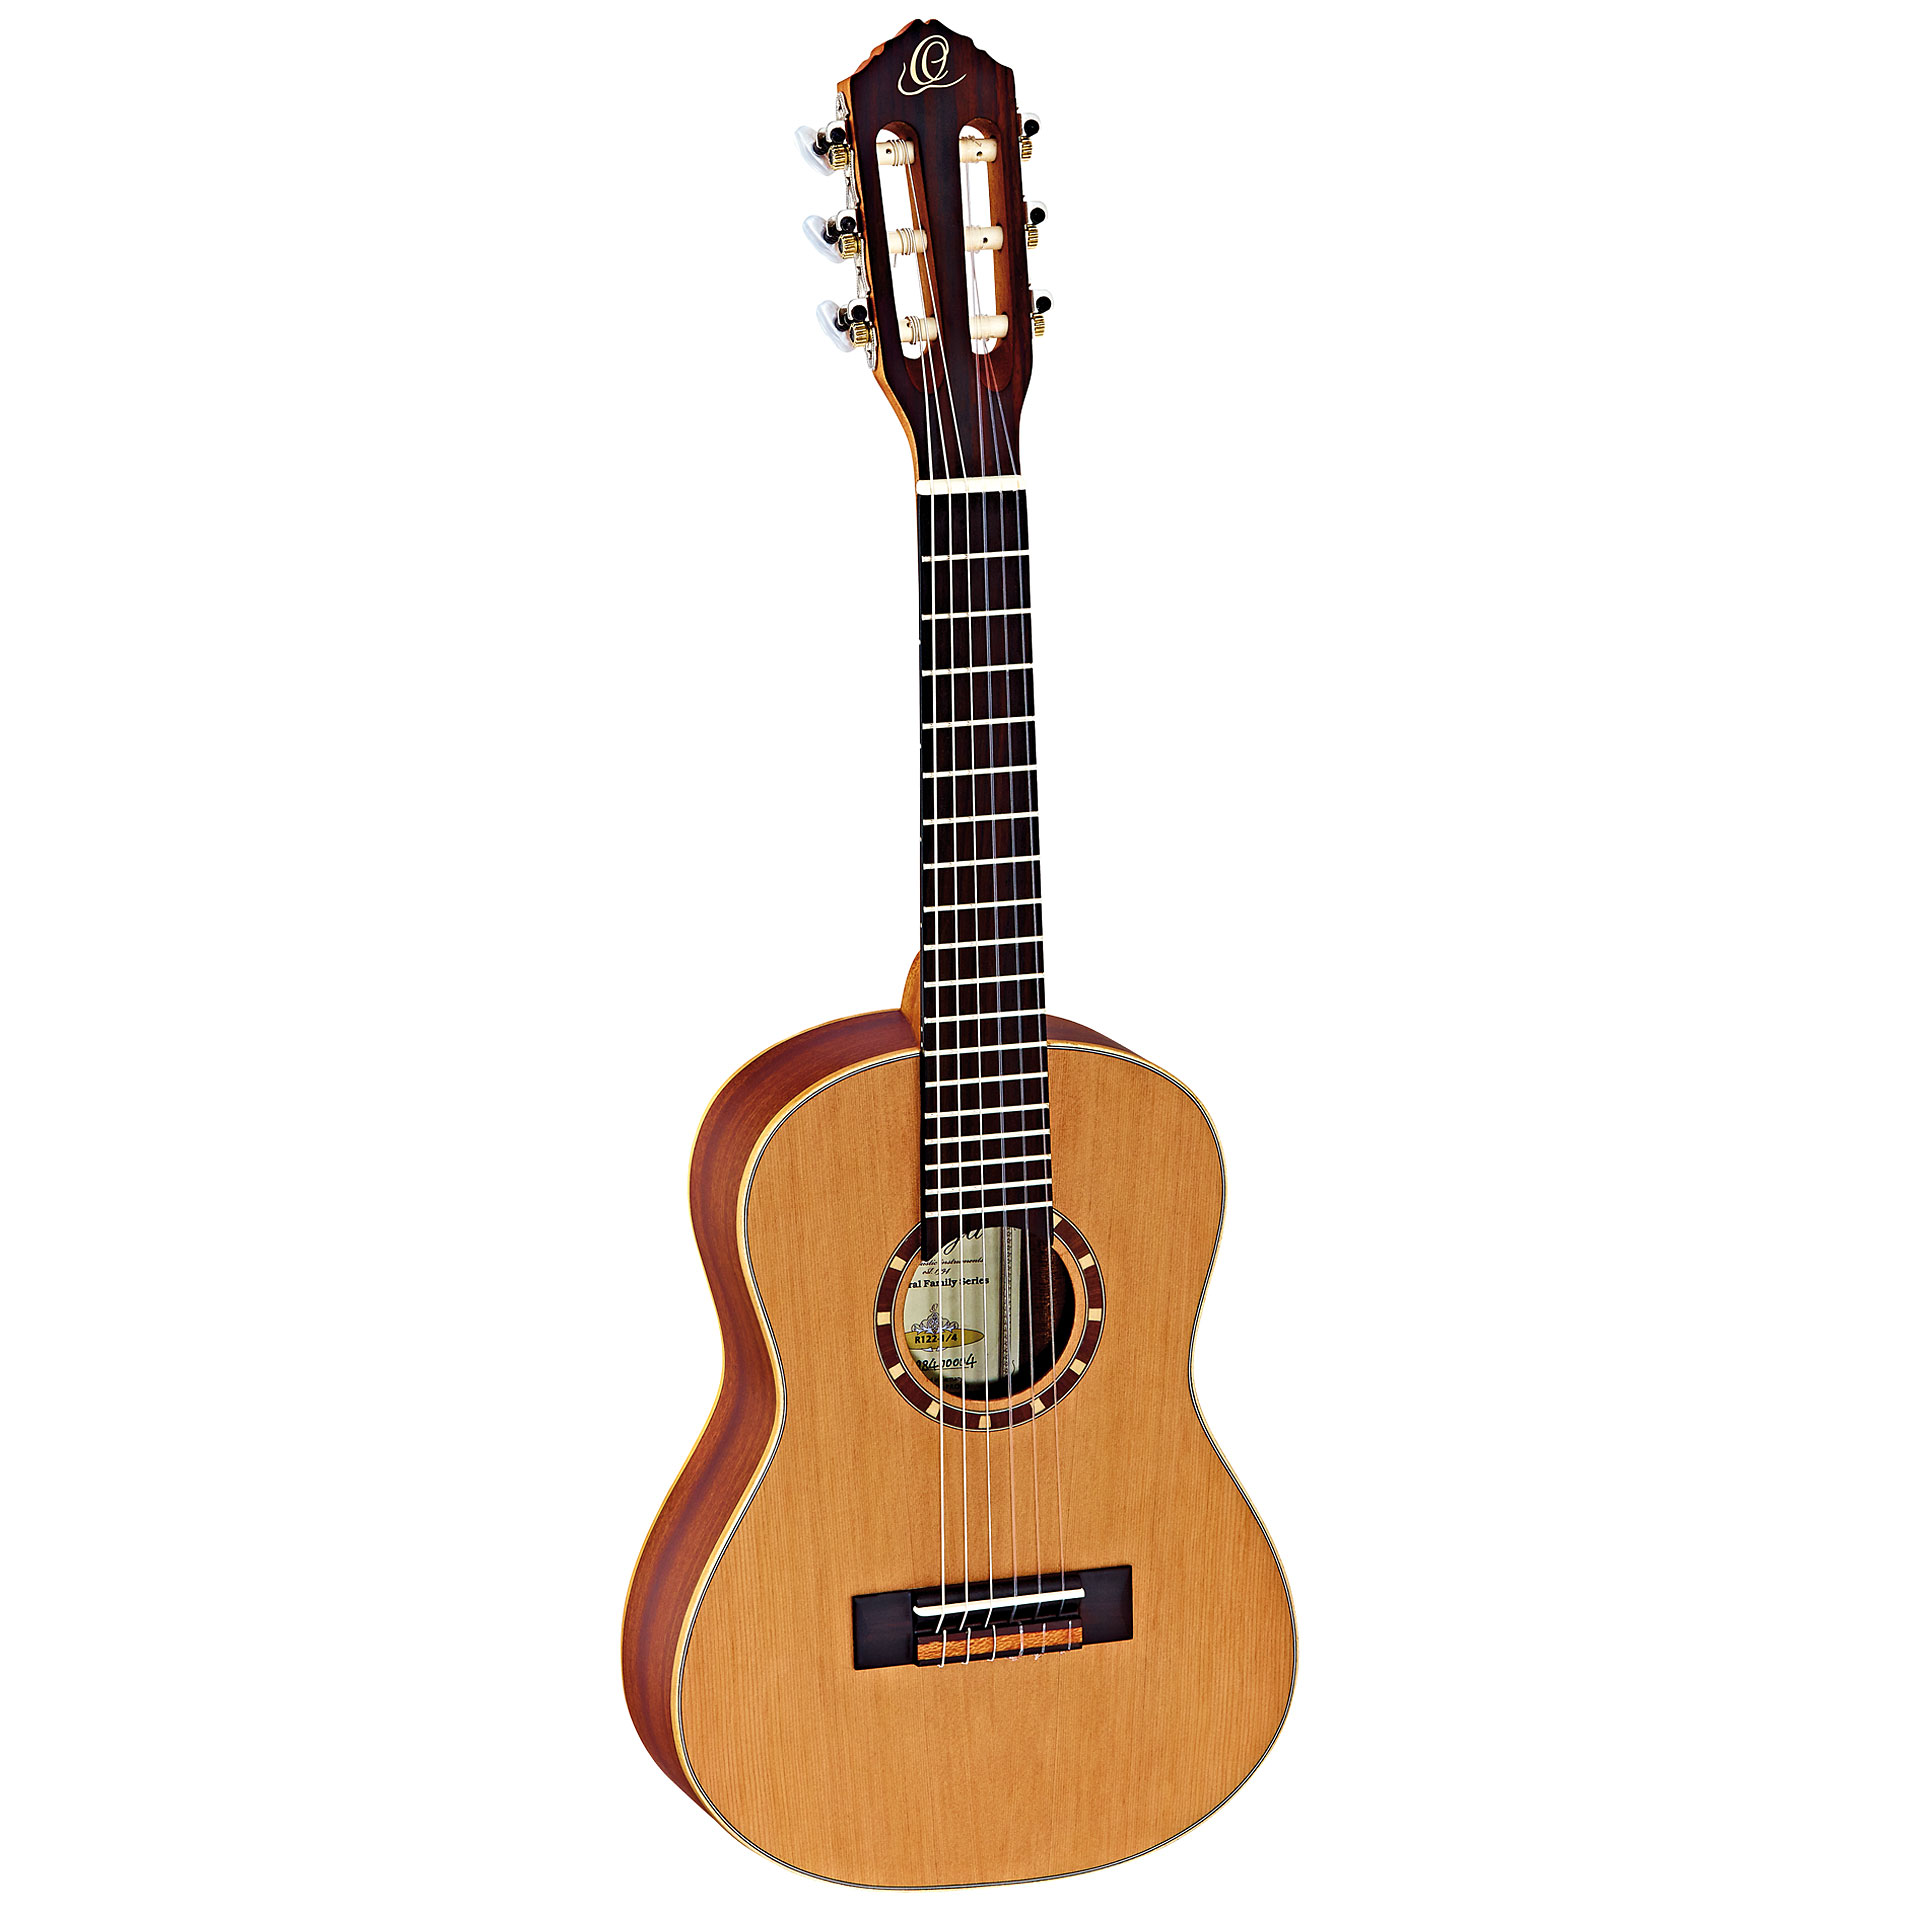 ortega r122 1 4 guitare classique. Black Bedroom Furniture Sets. Home Design Ideas